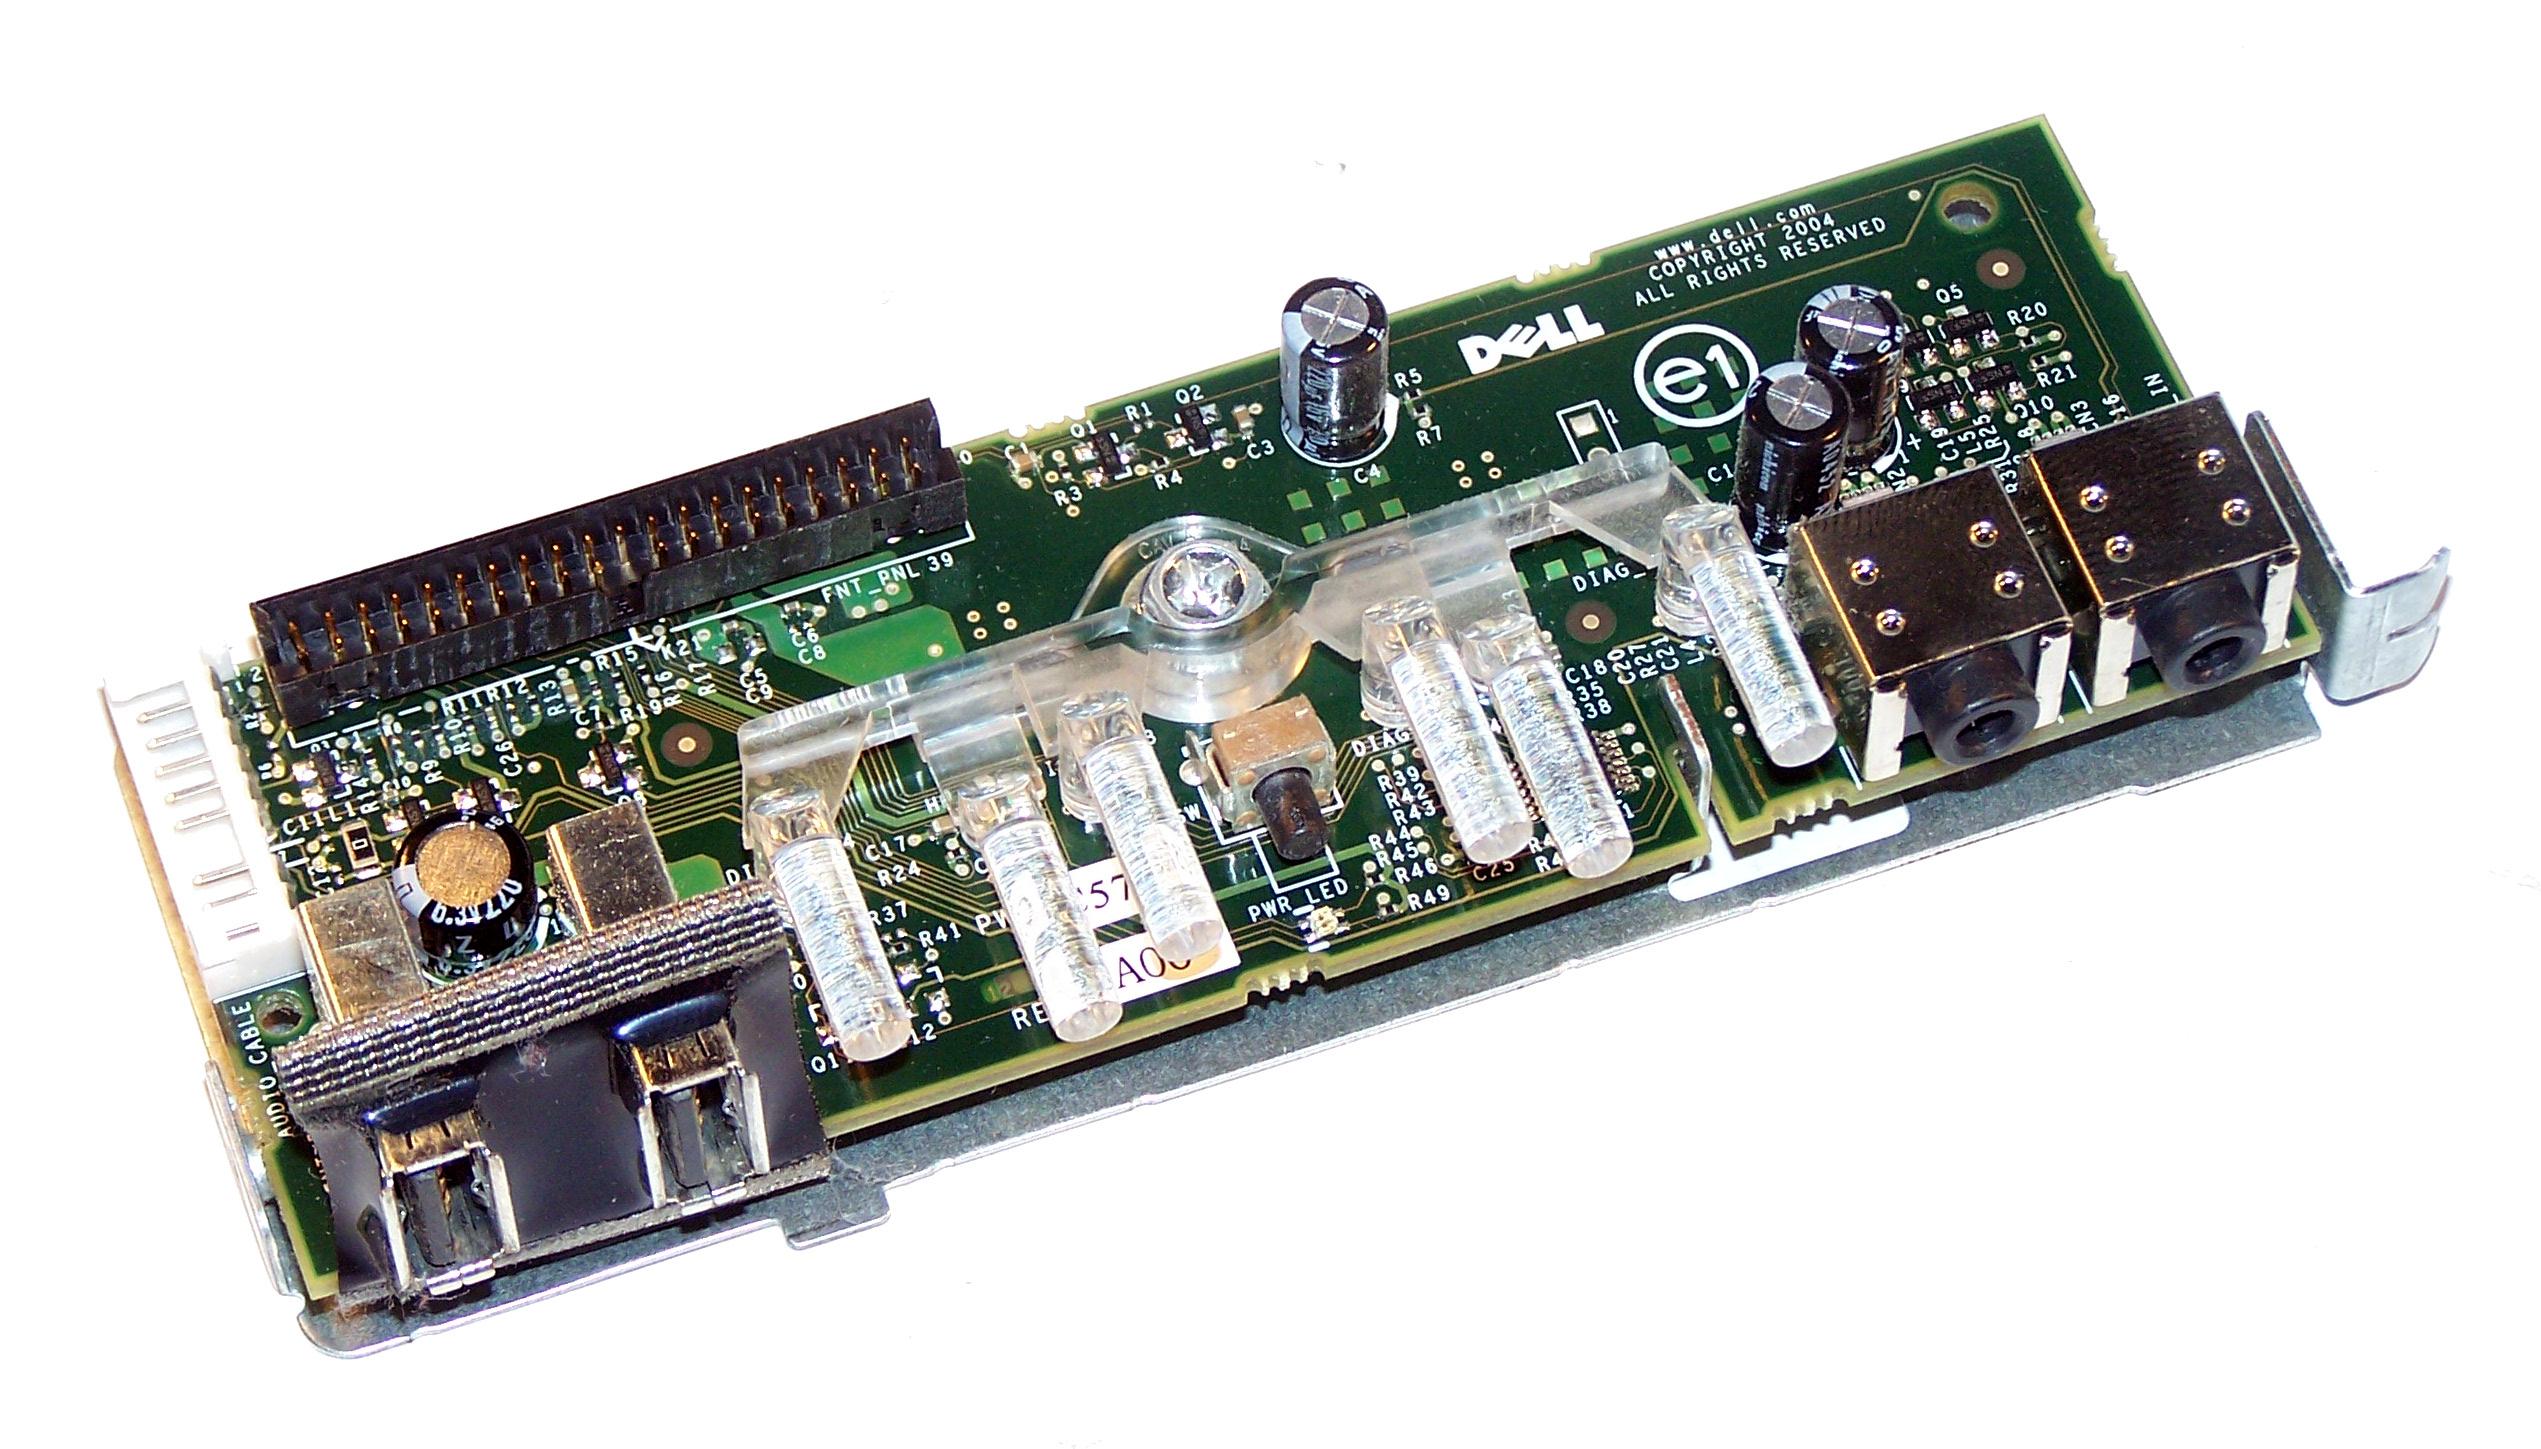 Dell C5708 Control Panel Assy, DT/MT (0C5708)